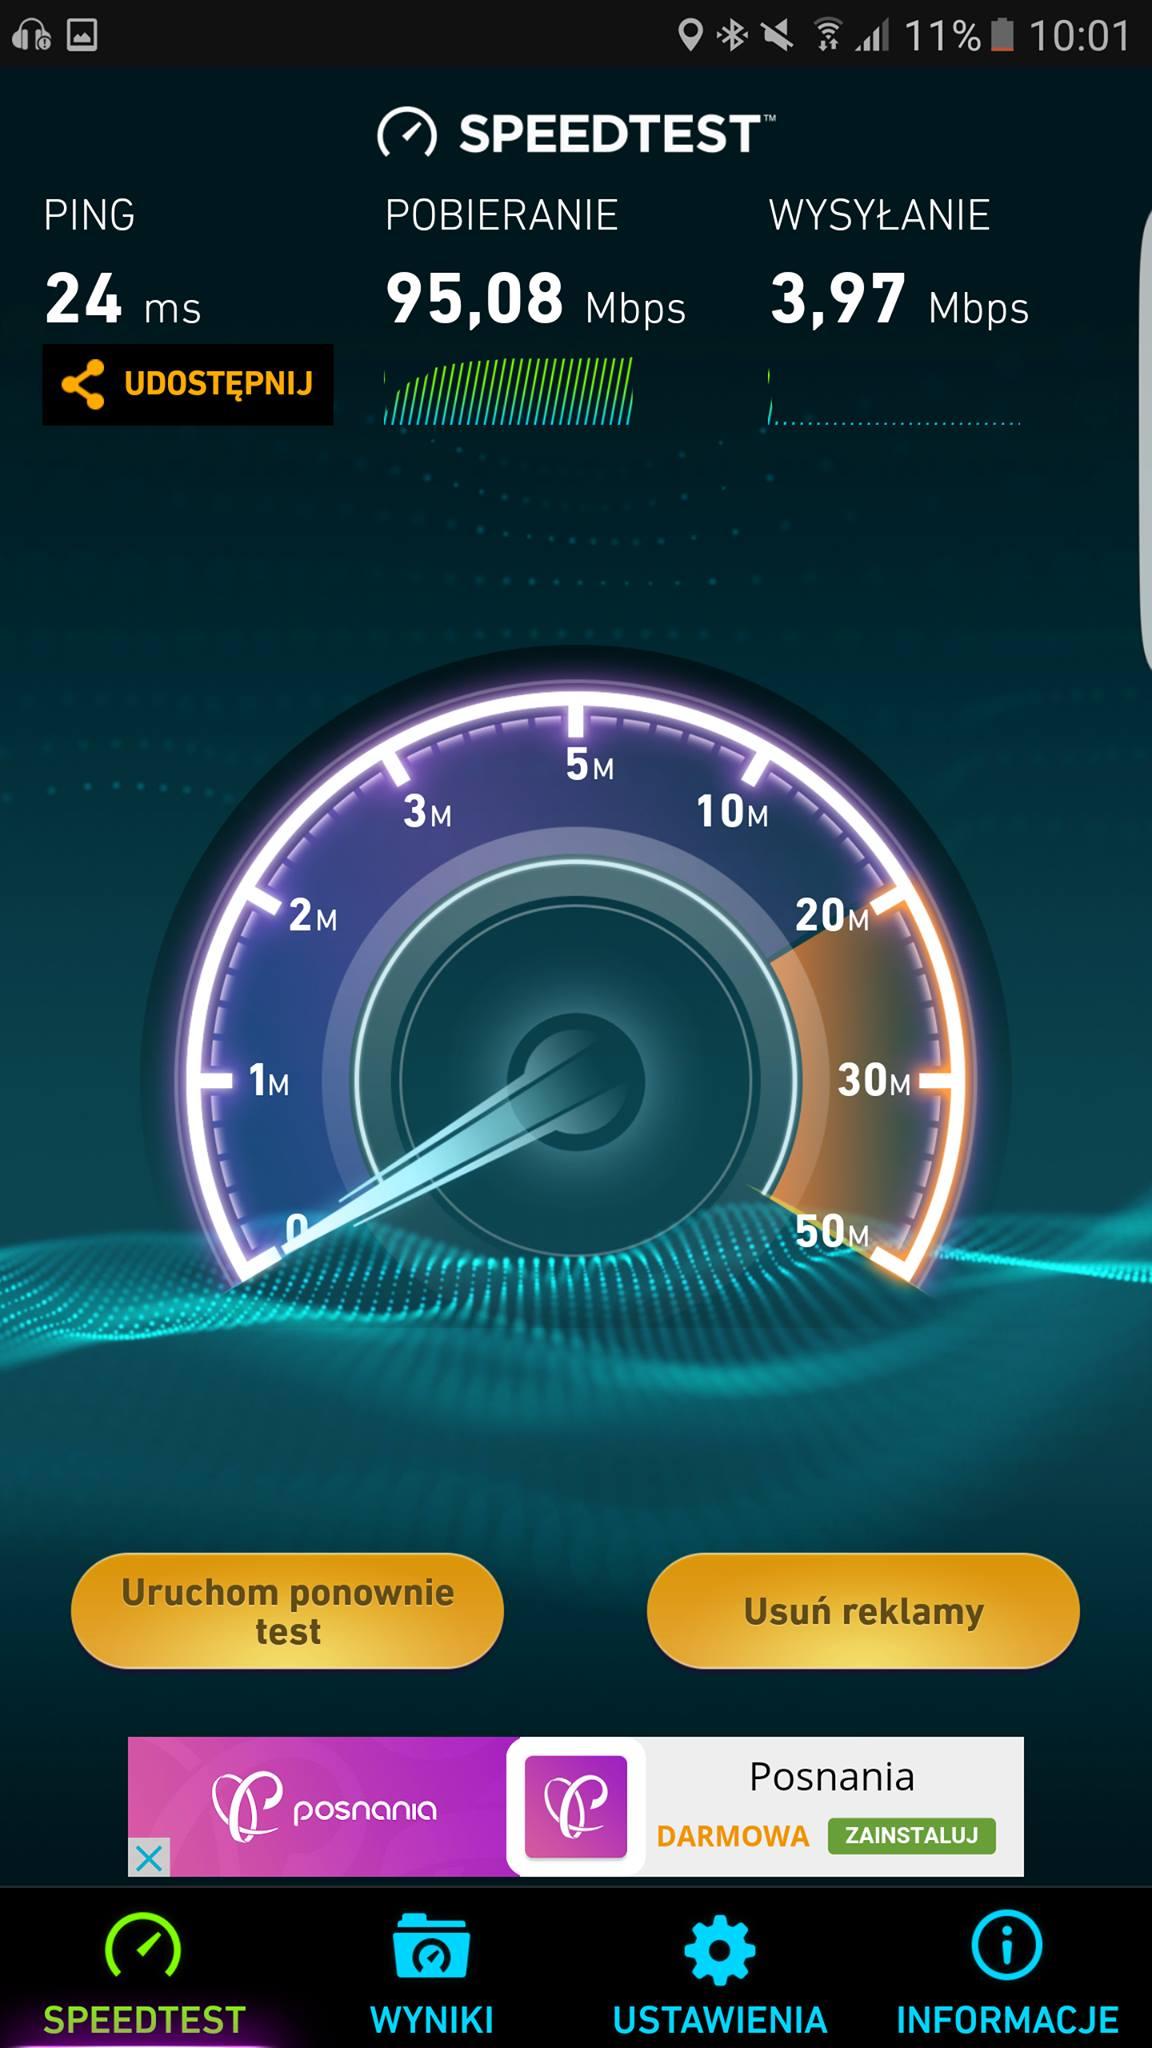 Kingston MobileLite Pro test wifi 5 GHz